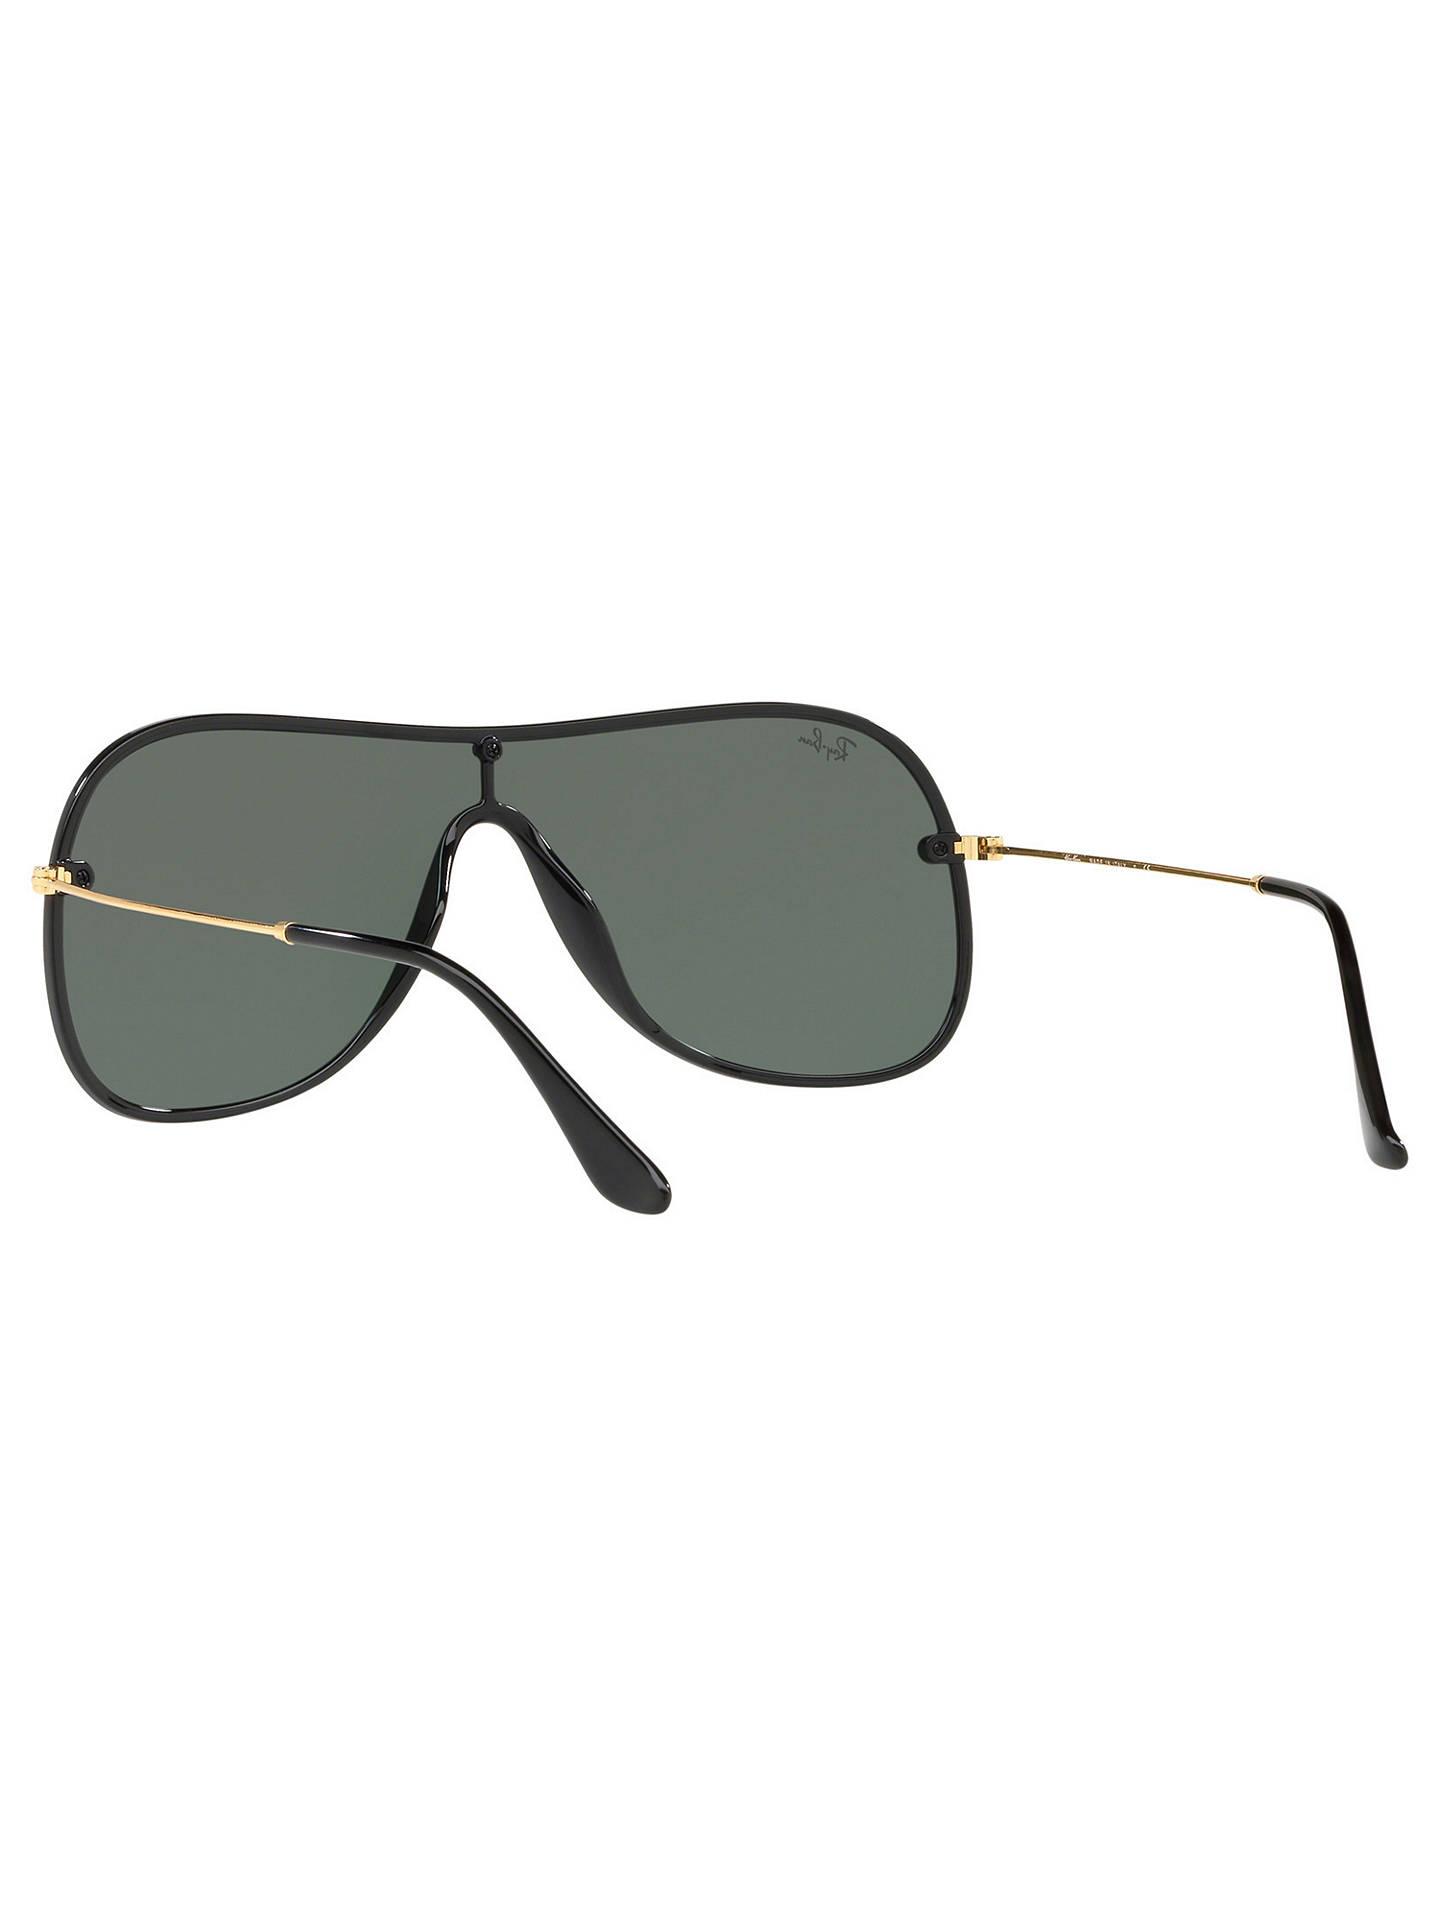 ac96ffb9fe Buy Ray-Ban RB4311N Unisex Aviator Sunglasses